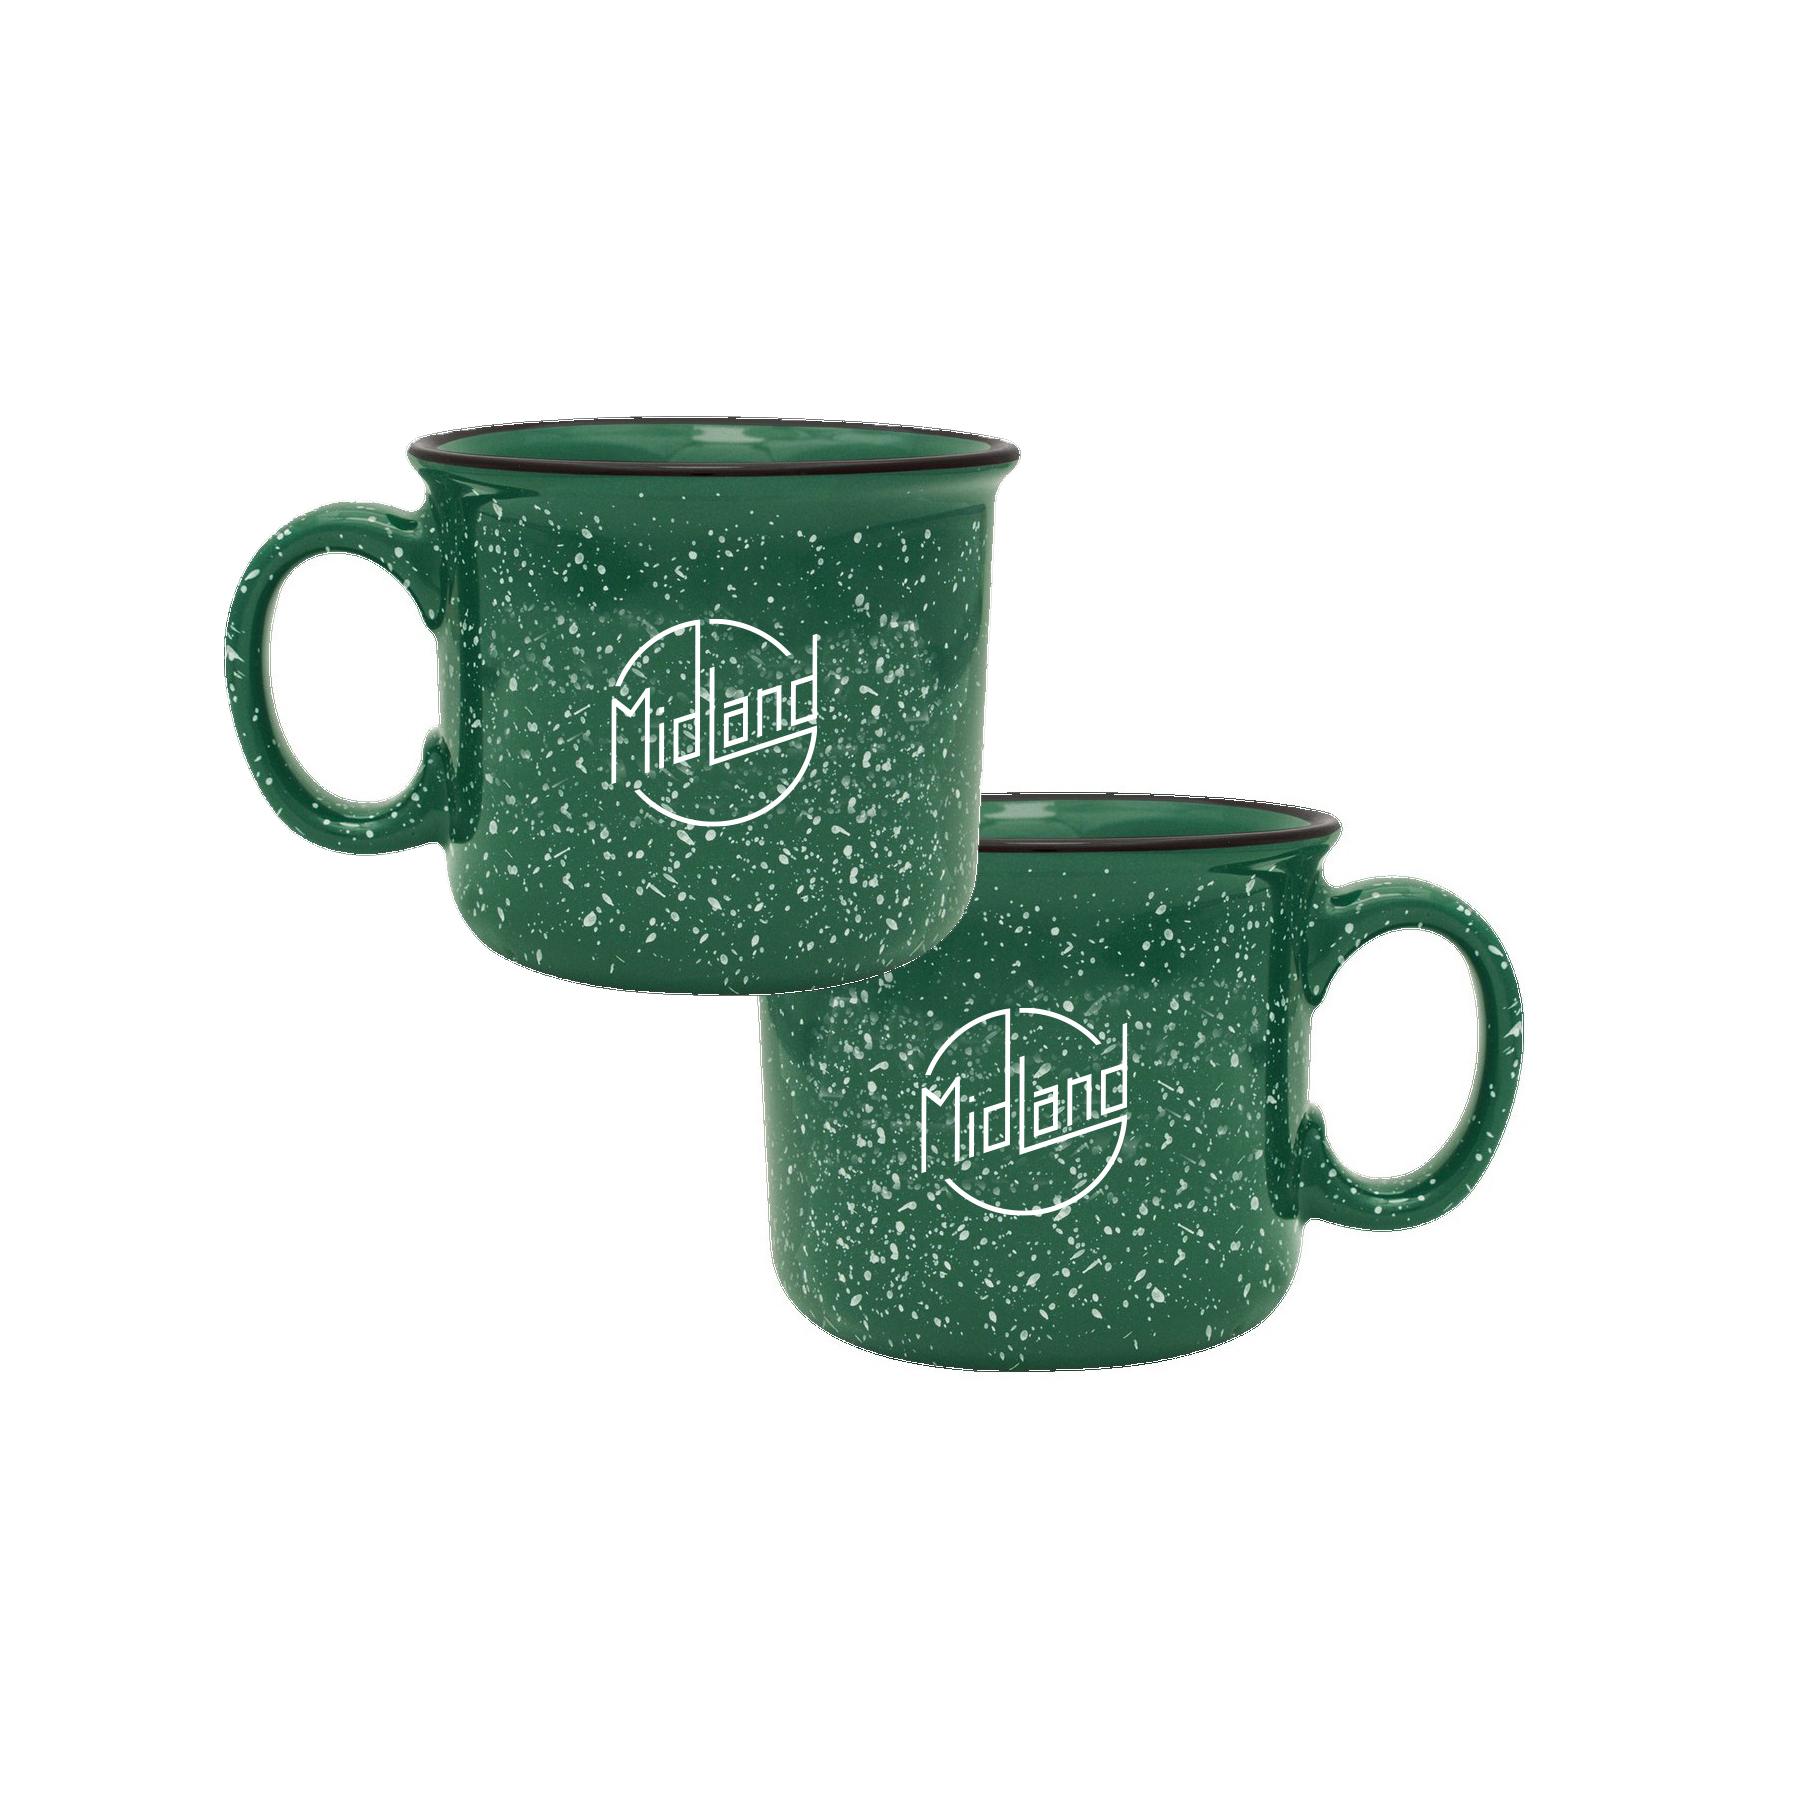 Midland Green Camper Mug